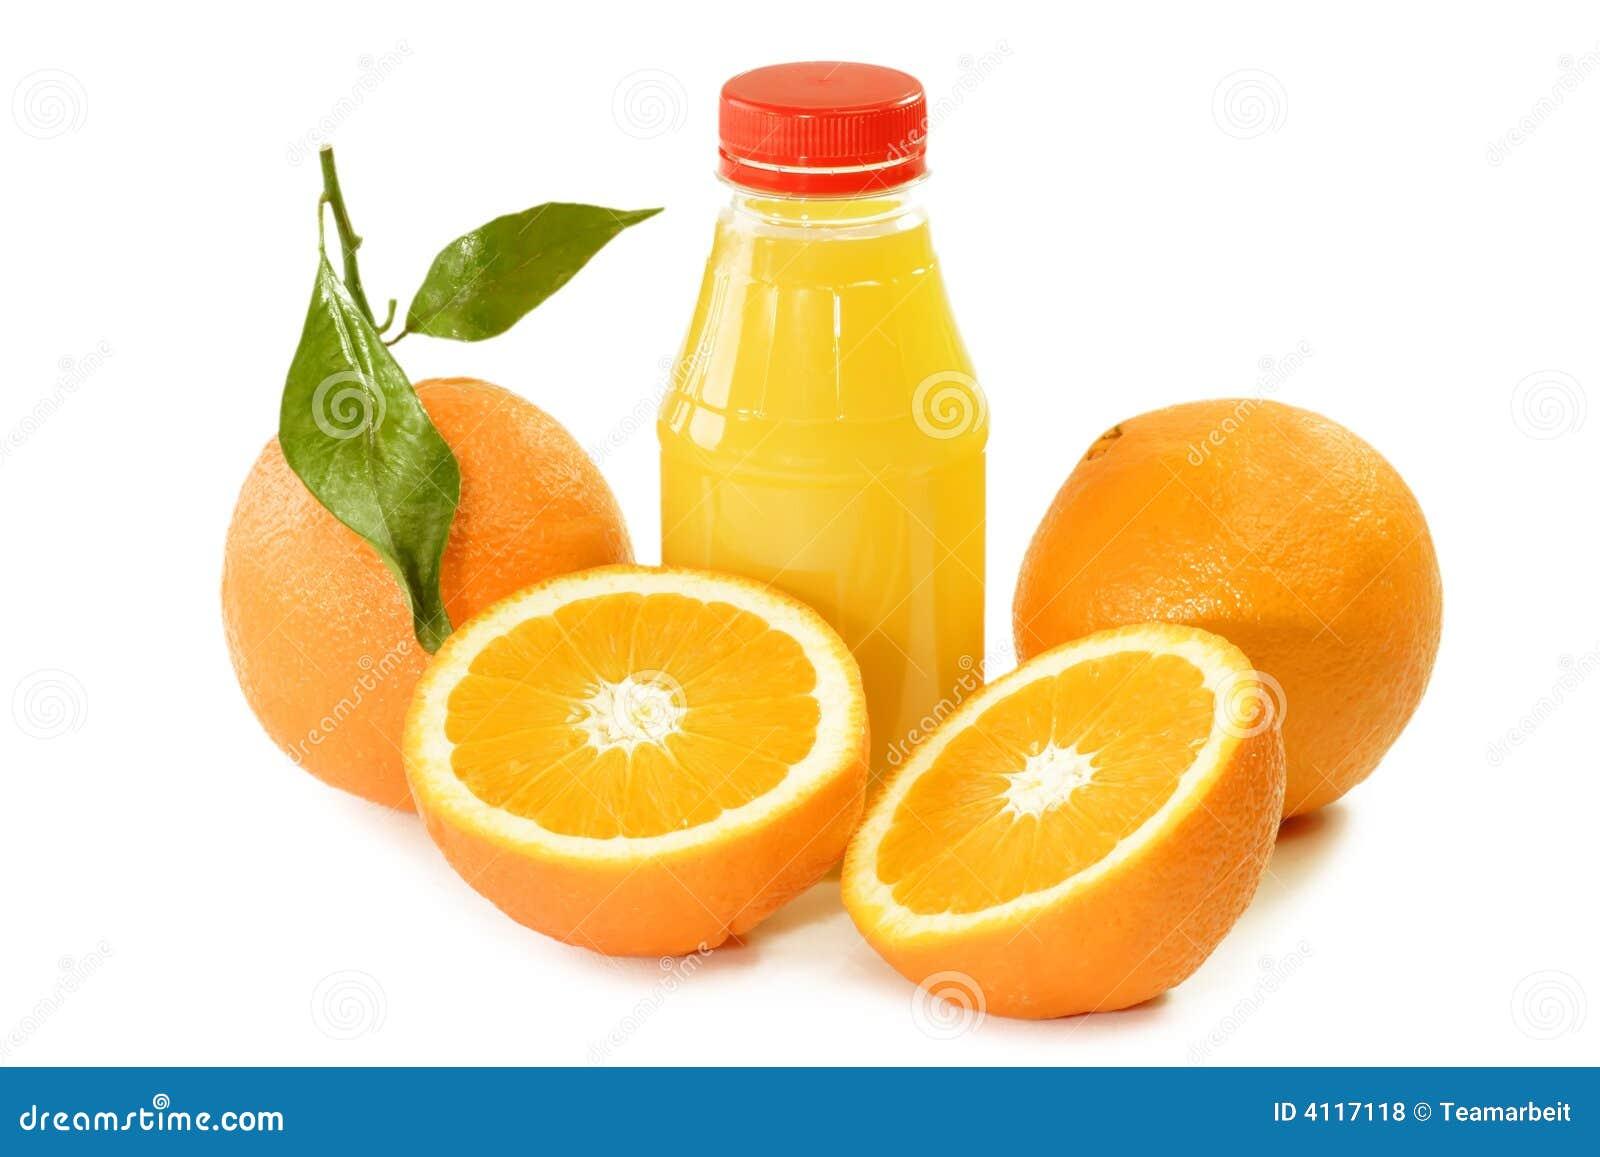 jus d 39 orange dans une bouteille photo stock image du nutrition orange 4117118. Black Bedroom Furniture Sets. Home Design Ideas